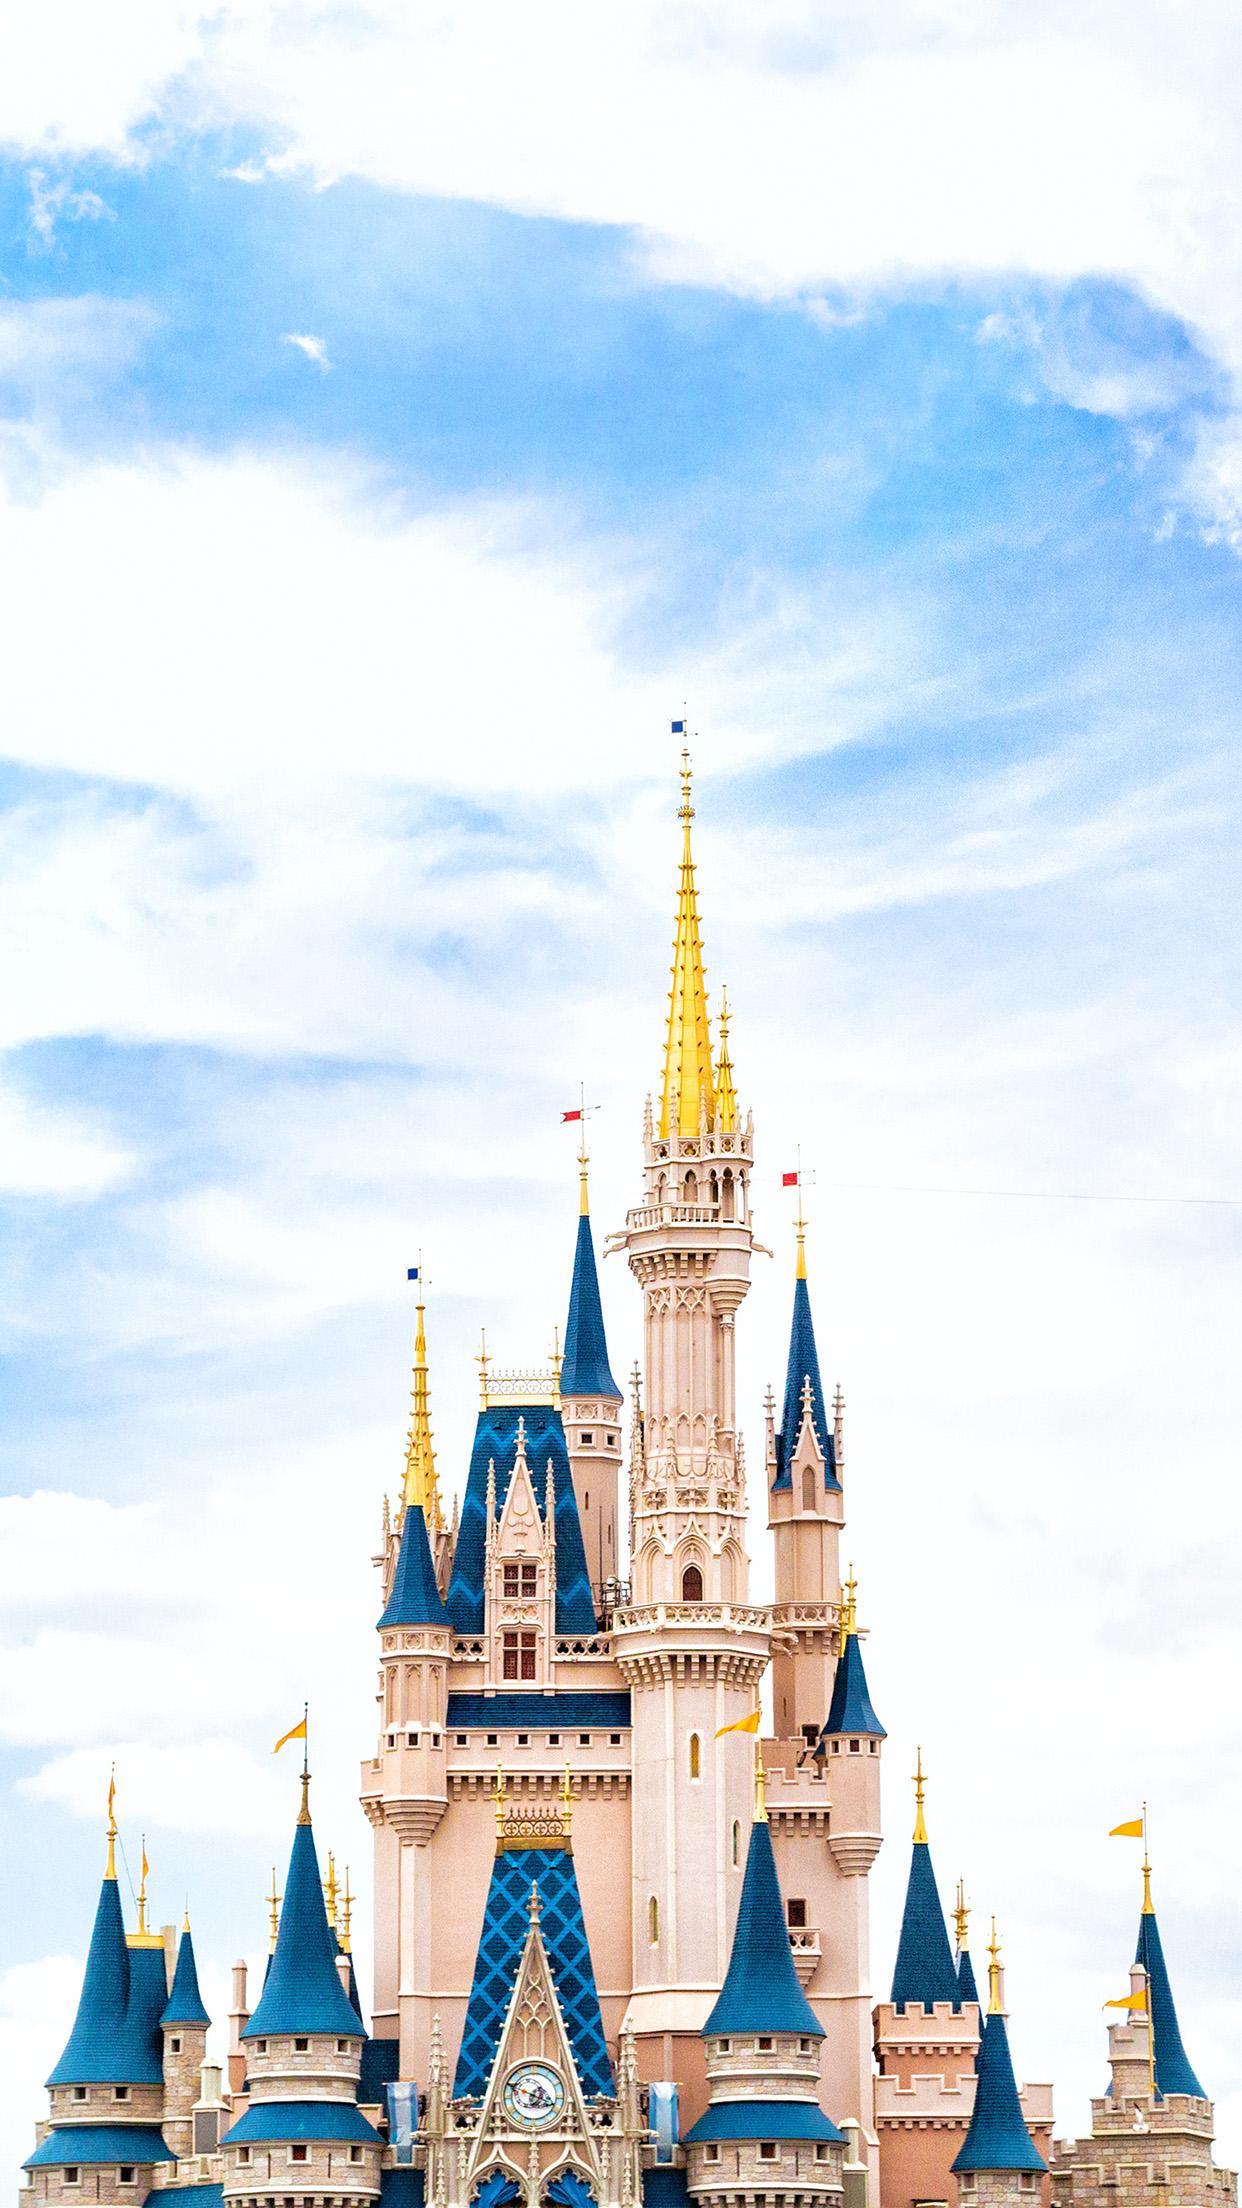 iPhone7papers.com | iPhone7 wallpaper | nn96-disney-world-castle-sky